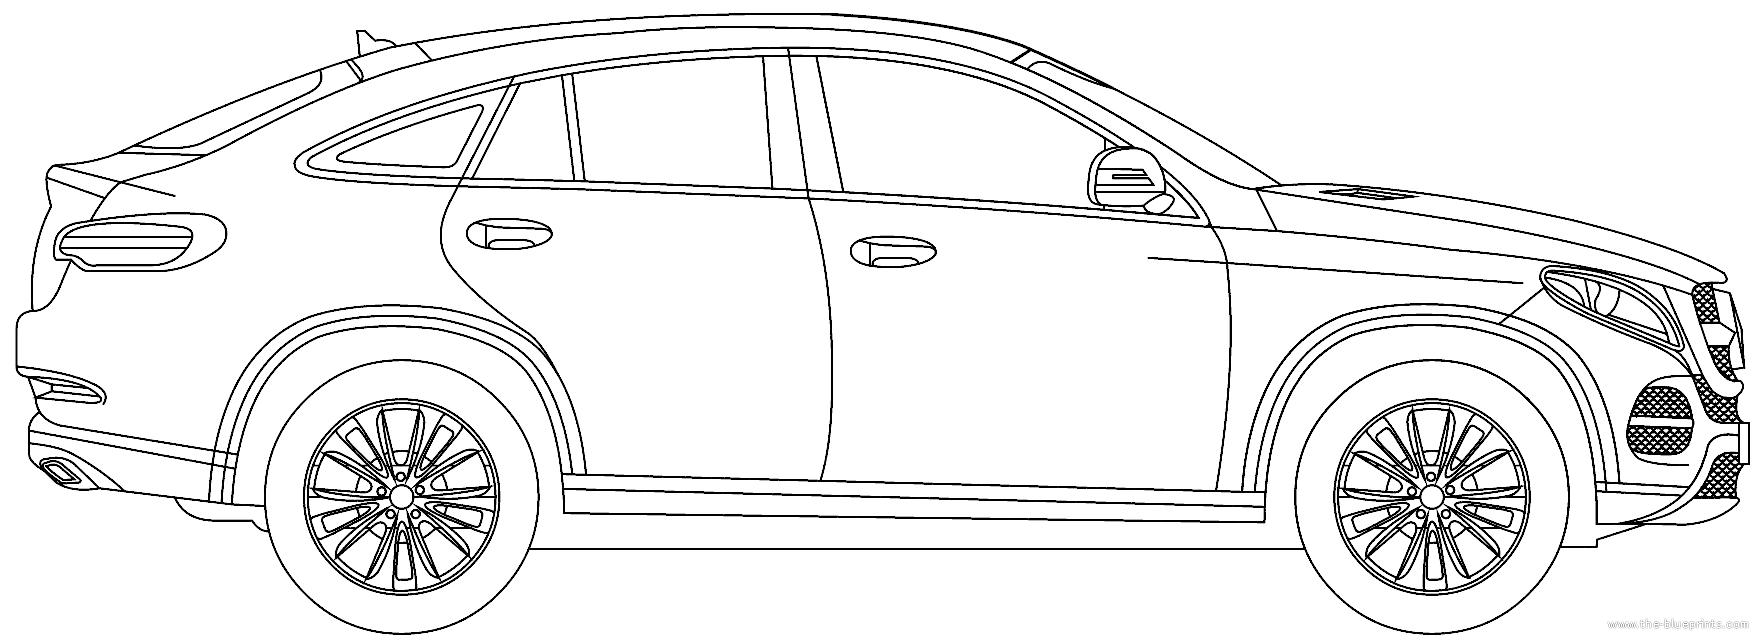 Blueprints > Cars > Mercedes-Benz > Mercedes-Benz GLC